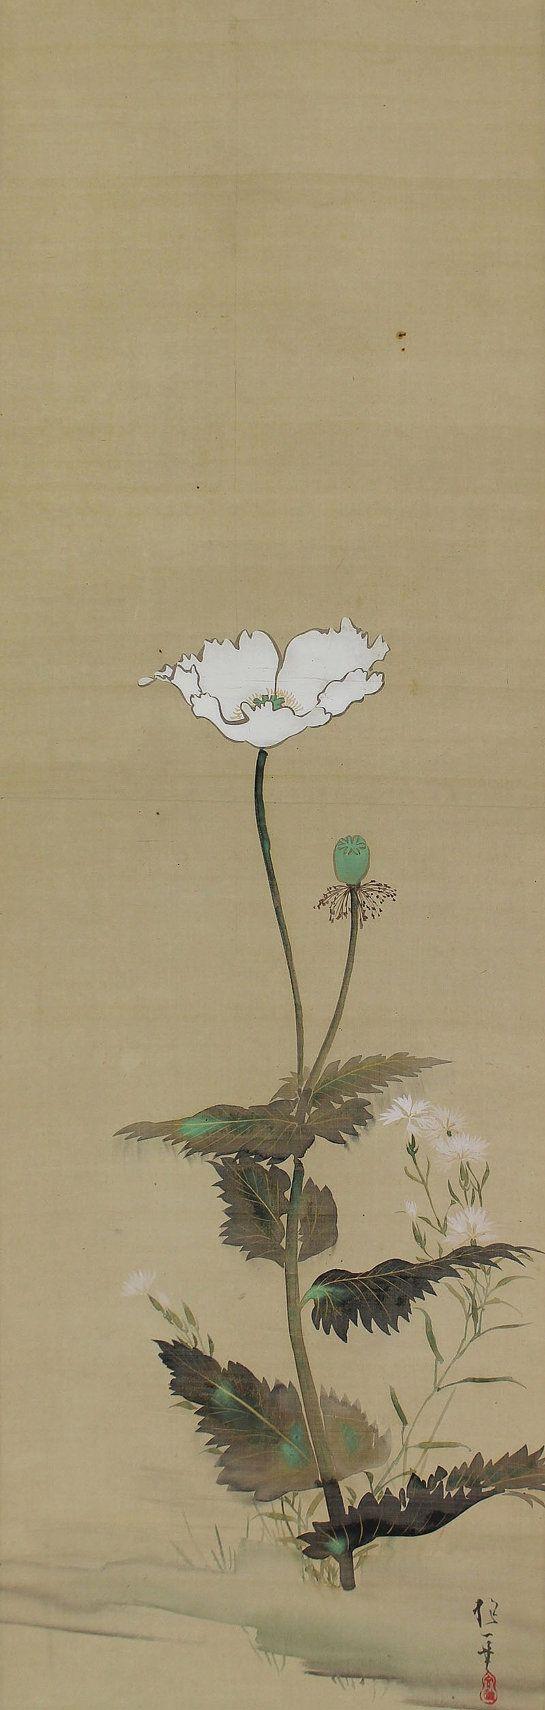 Antique Japanese Fine Art Wall Hanging Scroll Painting, Sakai Hōitsu (1761-1828) painter of the Rimpa school